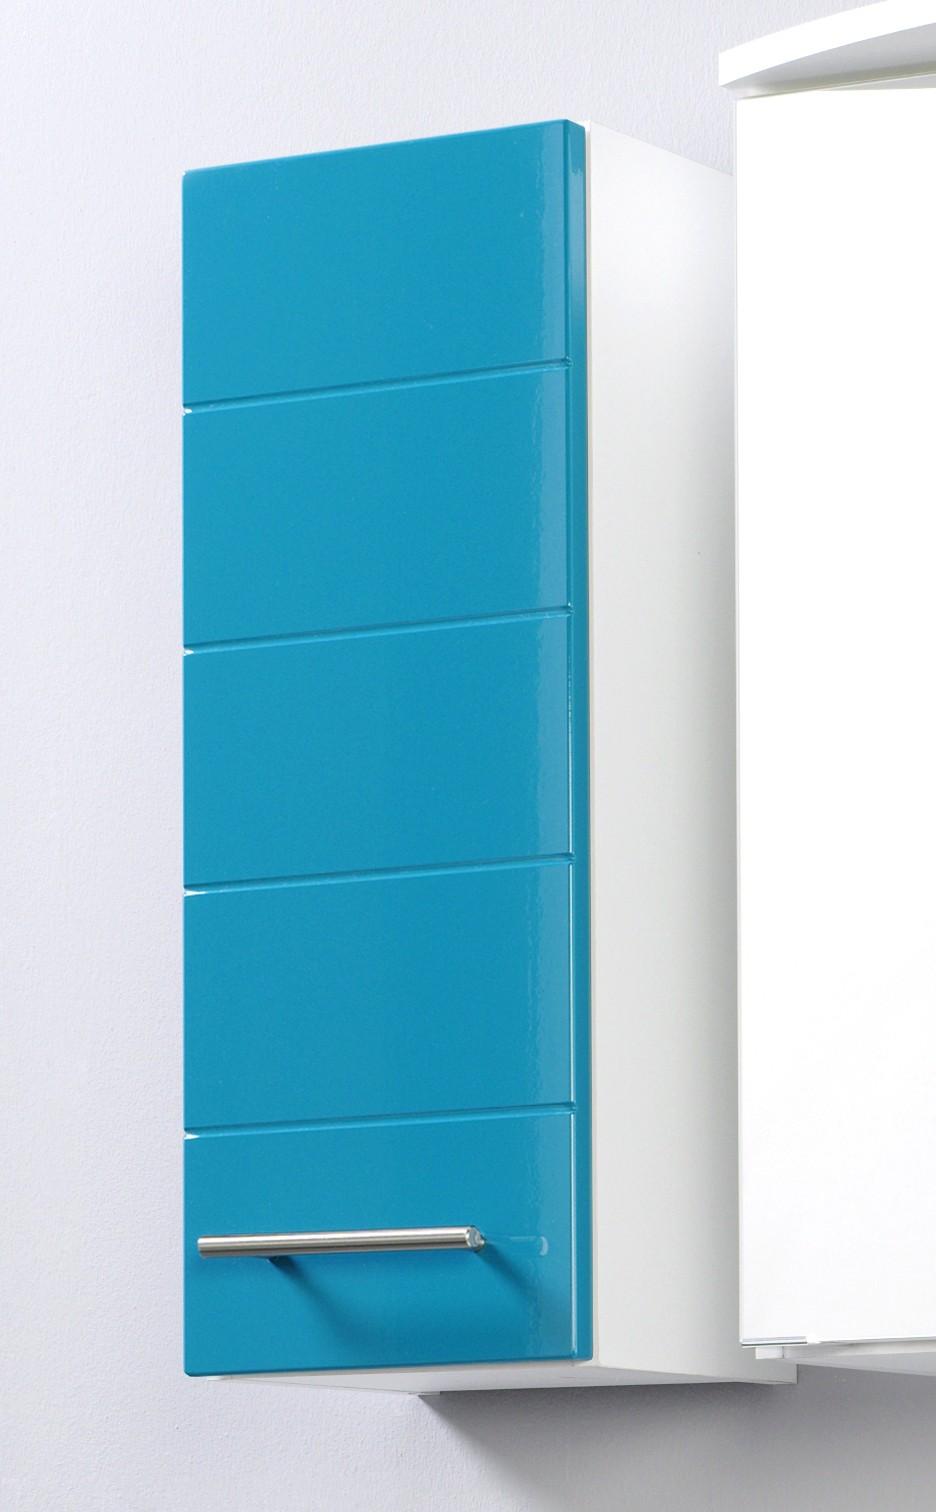 bad h ngeschrank rimini 1 t rig 25 cm breit hochglanz t rkis bad rimini. Black Bedroom Furniture Sets. Home Design Ideas